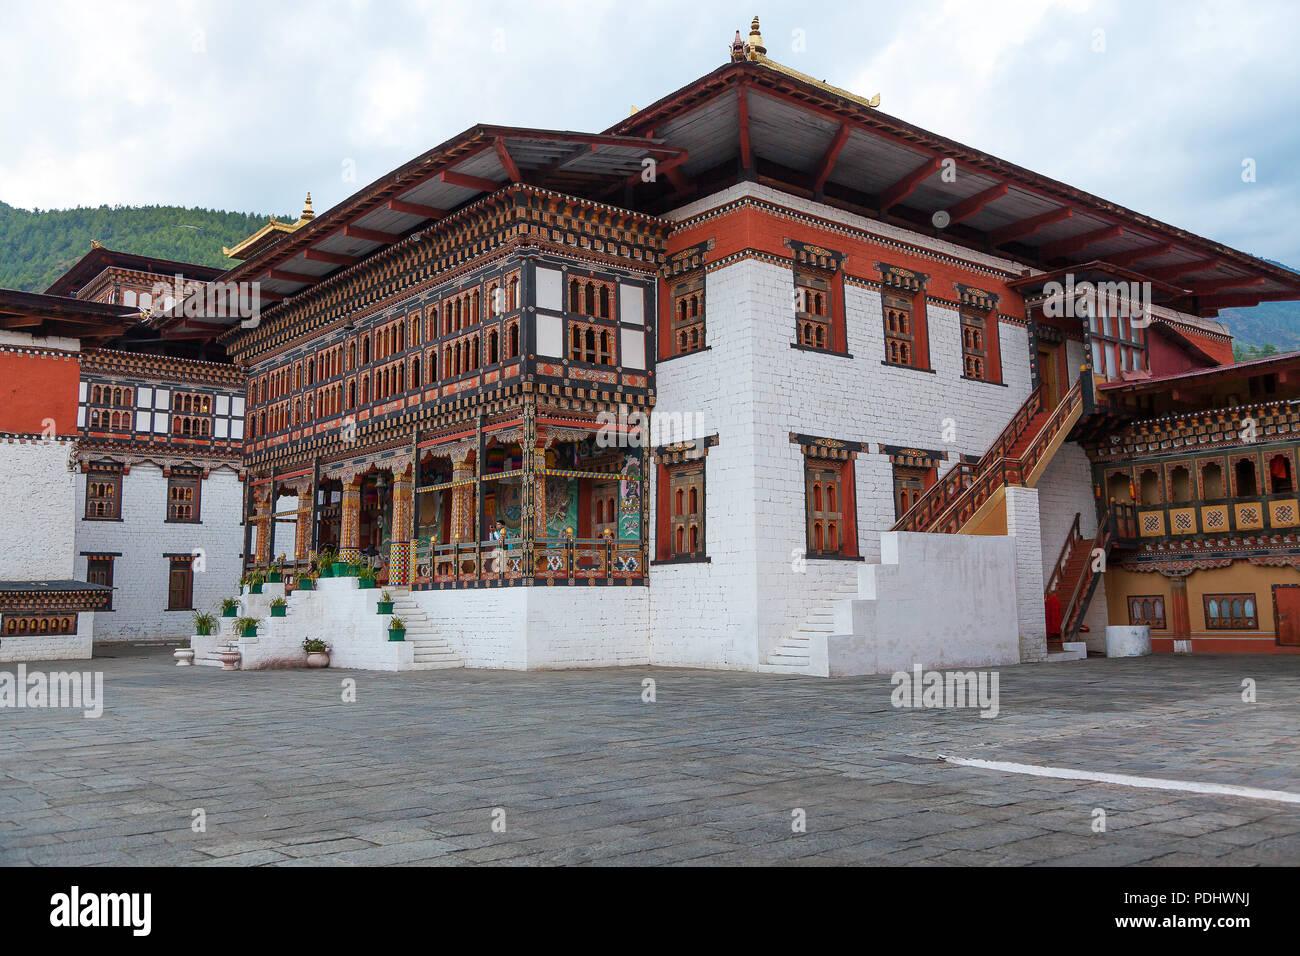 Tashichhoedzong dans la ville de Thimphu, Bhoutan Photo Stock